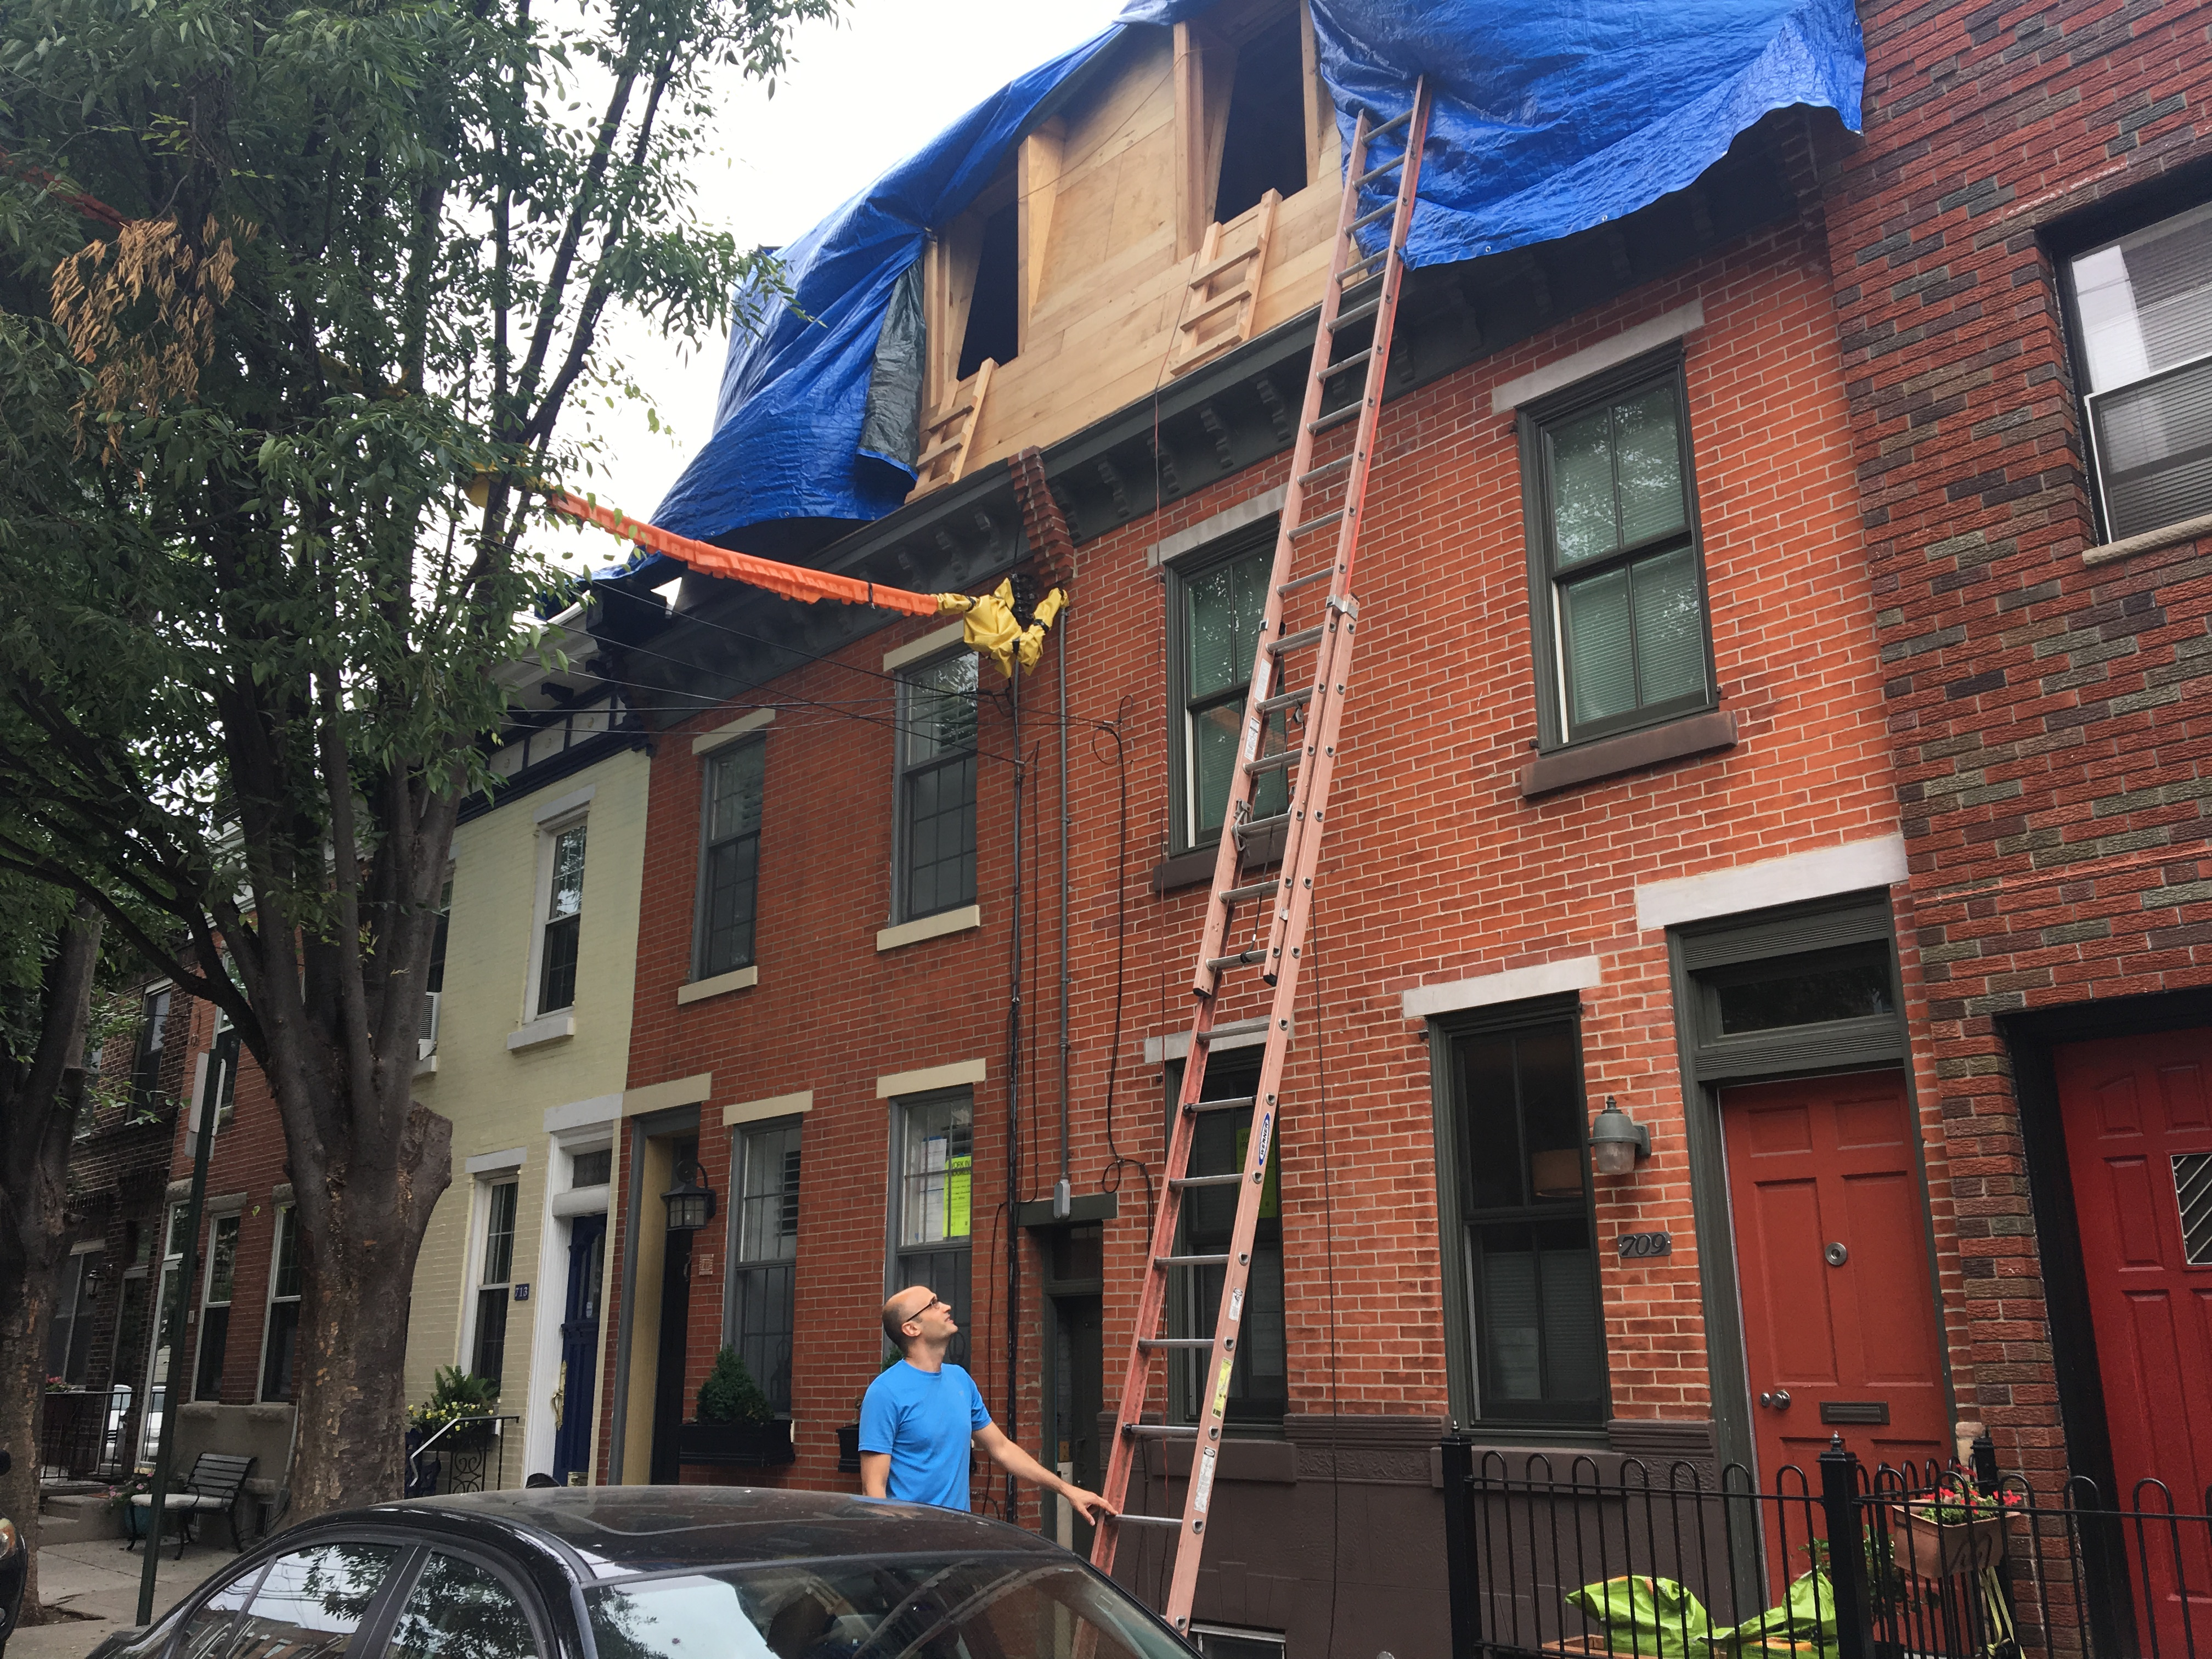 Laurent Hedquist inspects the third-floor addiiton he is putting on top of his Bella Vista home. He designed a twin version for his nextdoor neighbor.